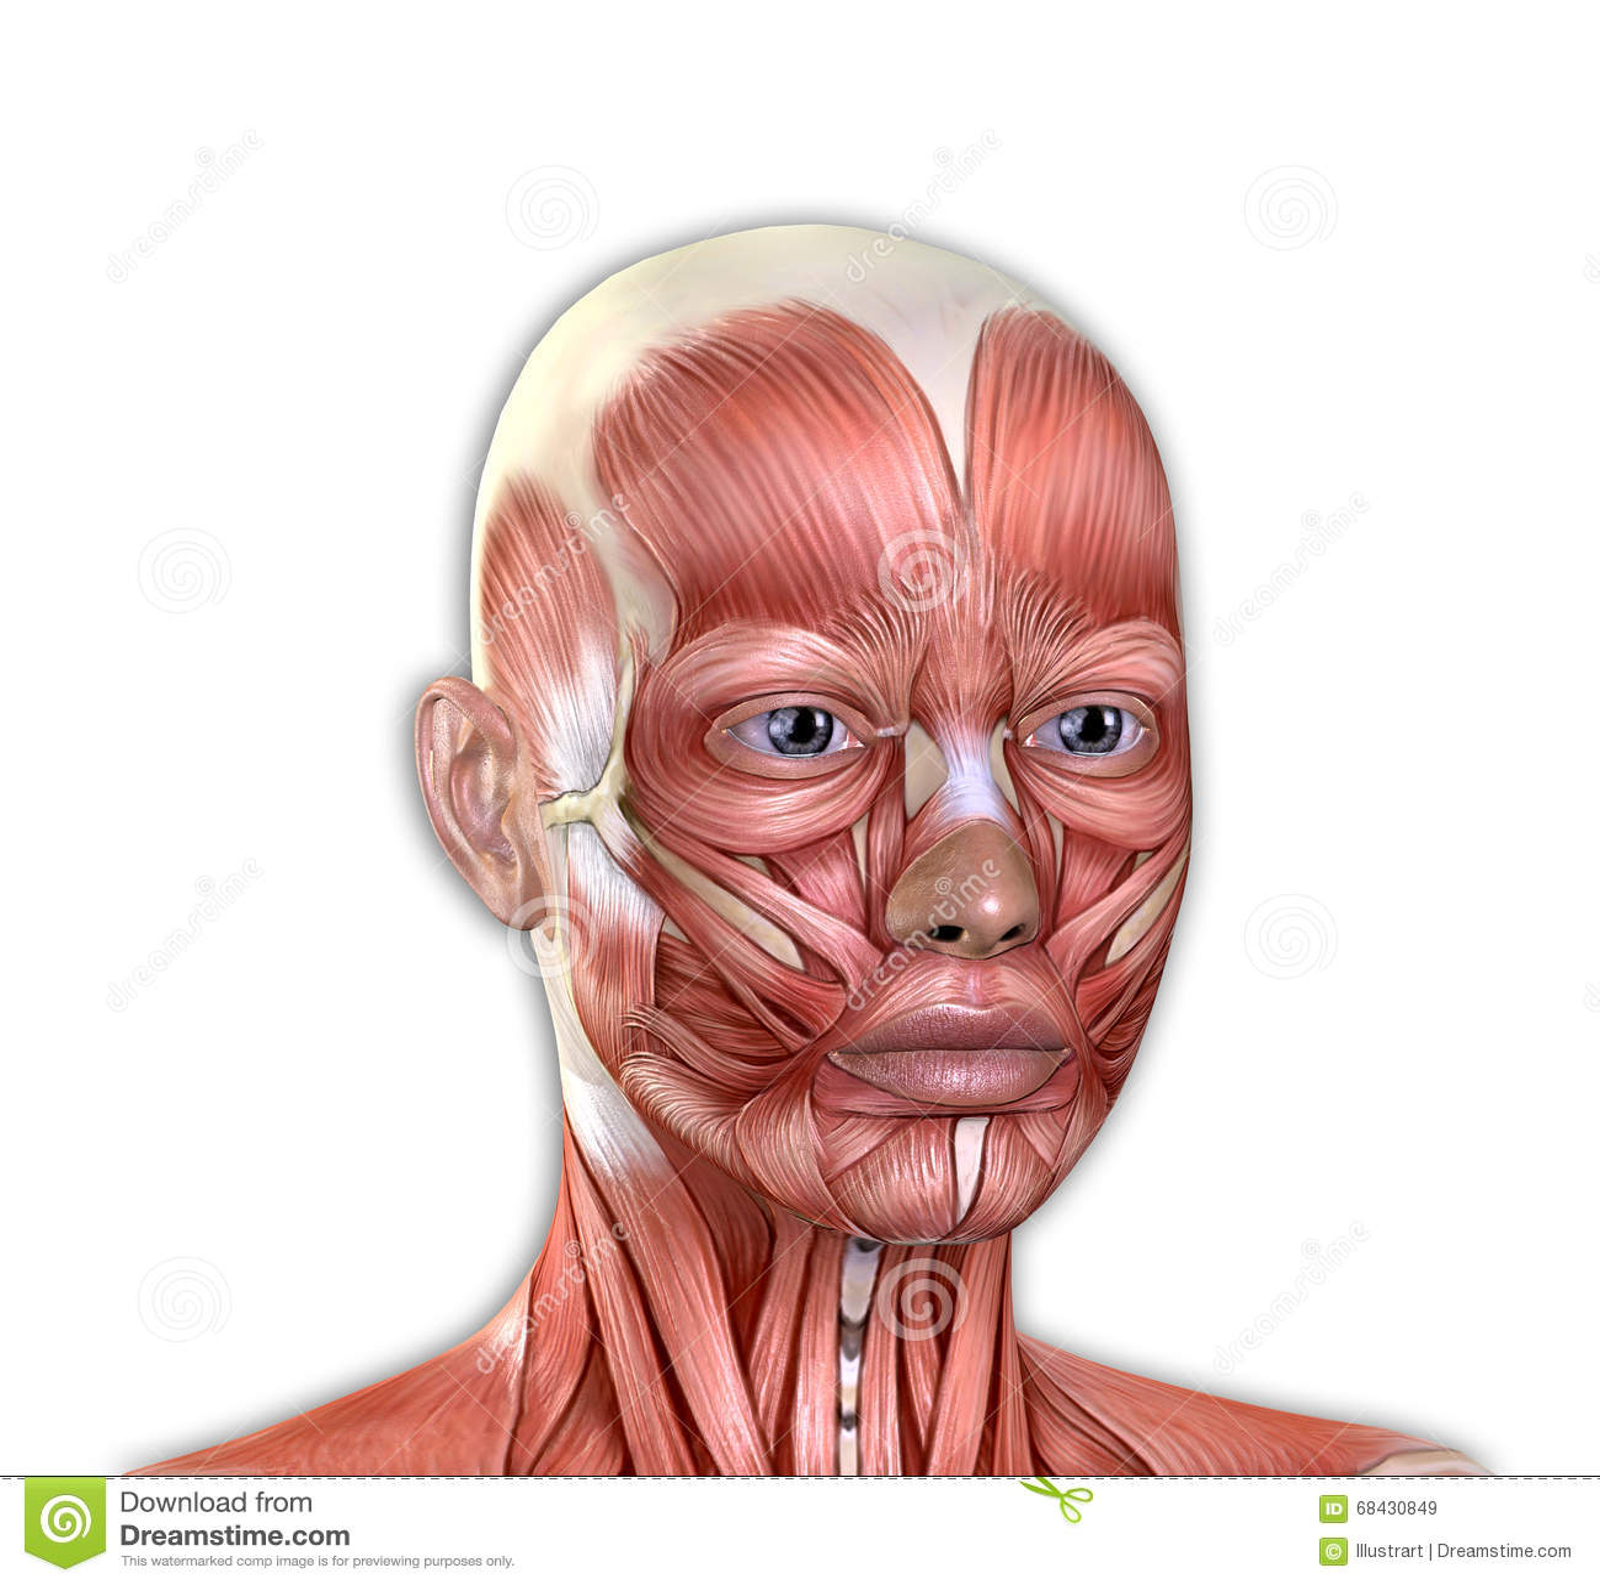 Female Face Muscles Anatomy Stock Illustration - Illustration of ...